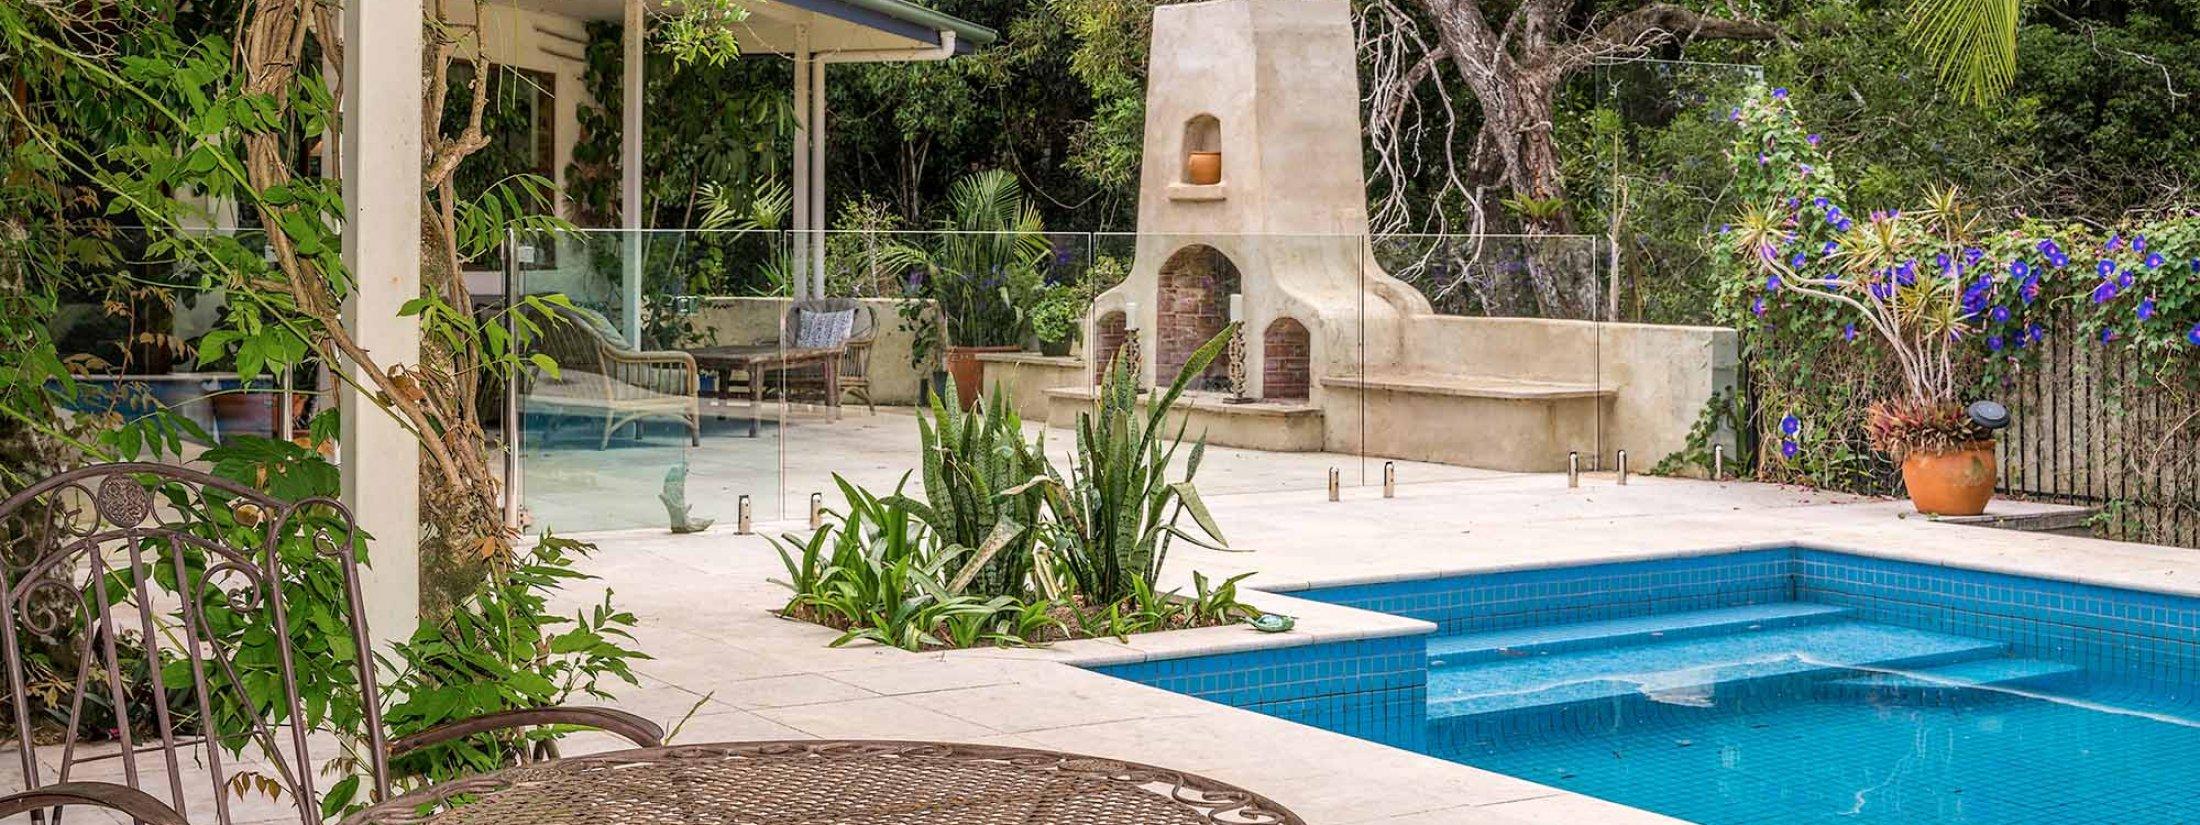 Casa Serena - Byron Bay - Pool Area d